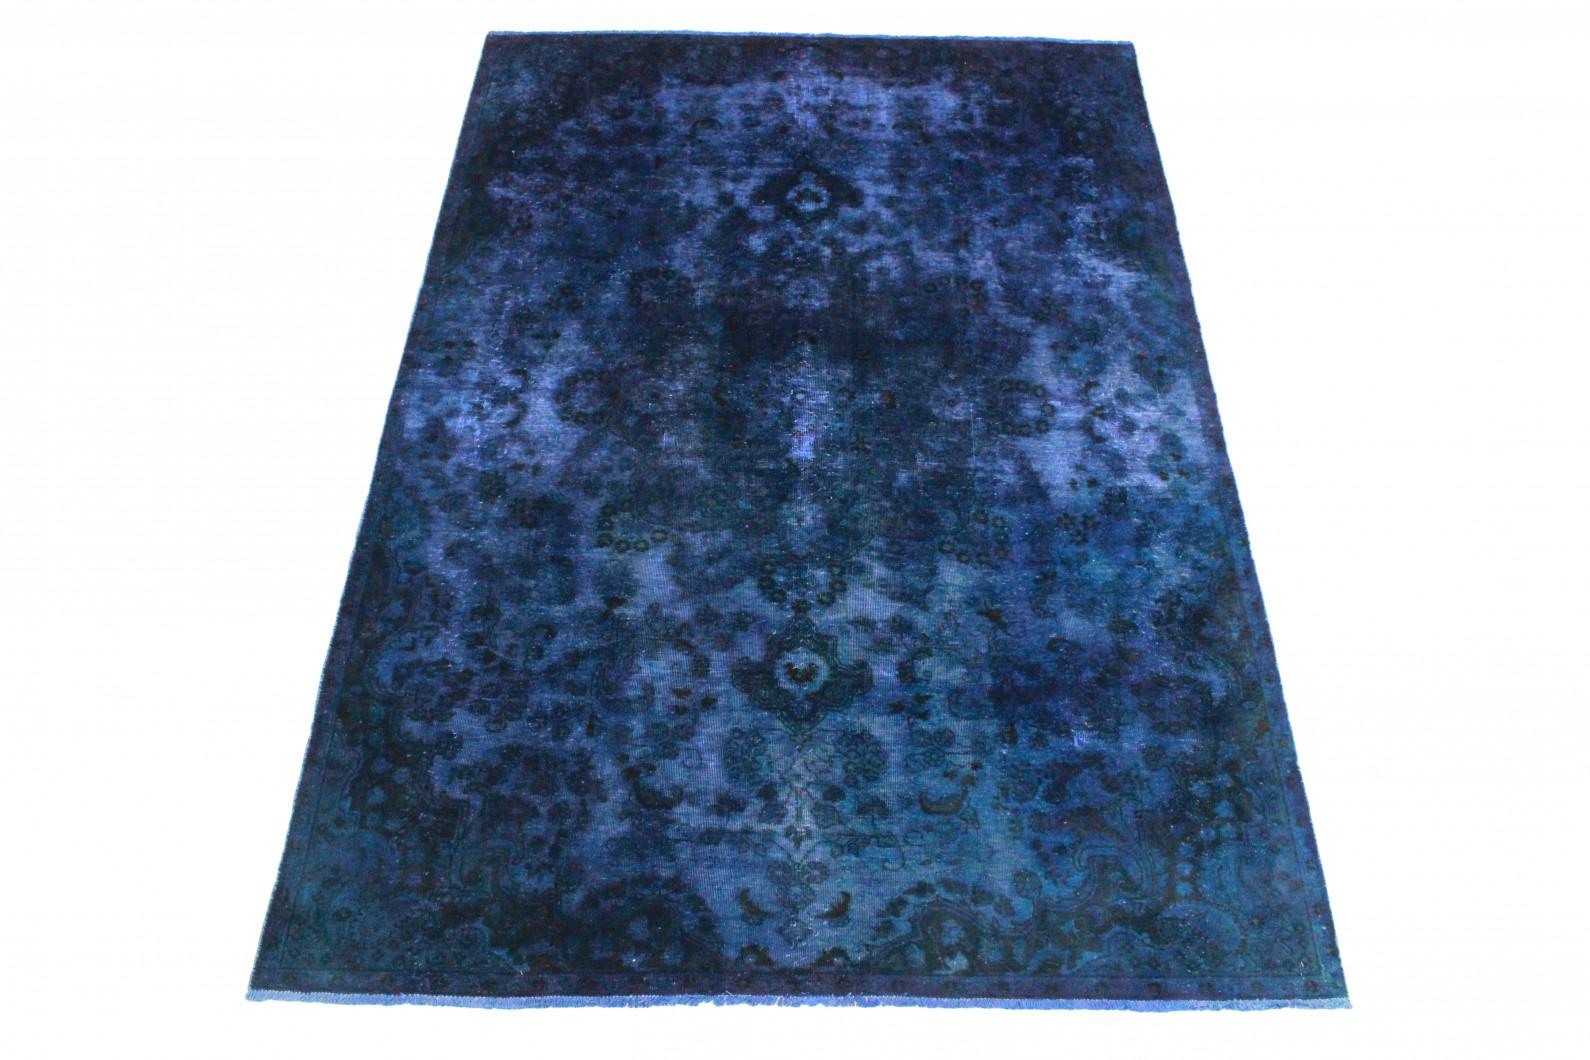 vintage teppich blau lila in 290x200 1001 3501 bei. Black Bedroom Furniture Sets. Home Design Ideas